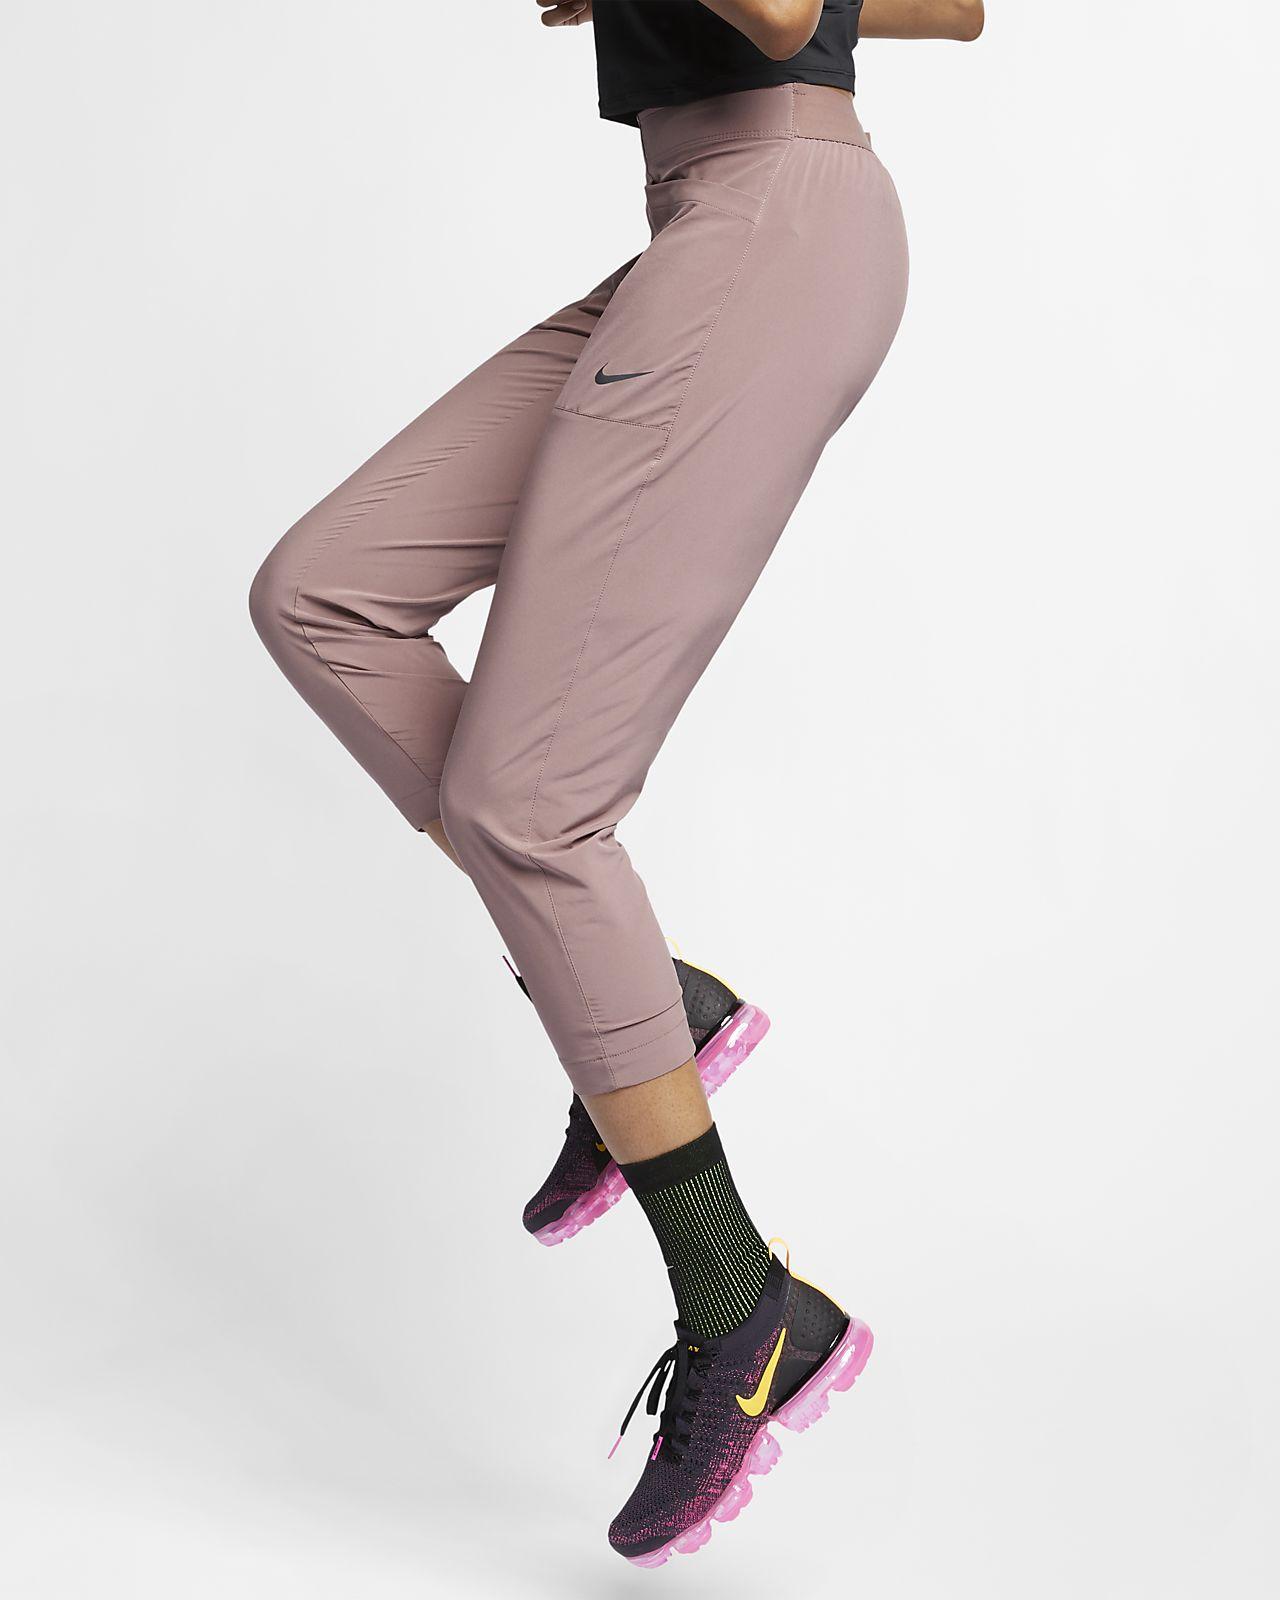 ac753bf4516 Nike Swift Women s 7 8 Running Trousers. Nike.com CA